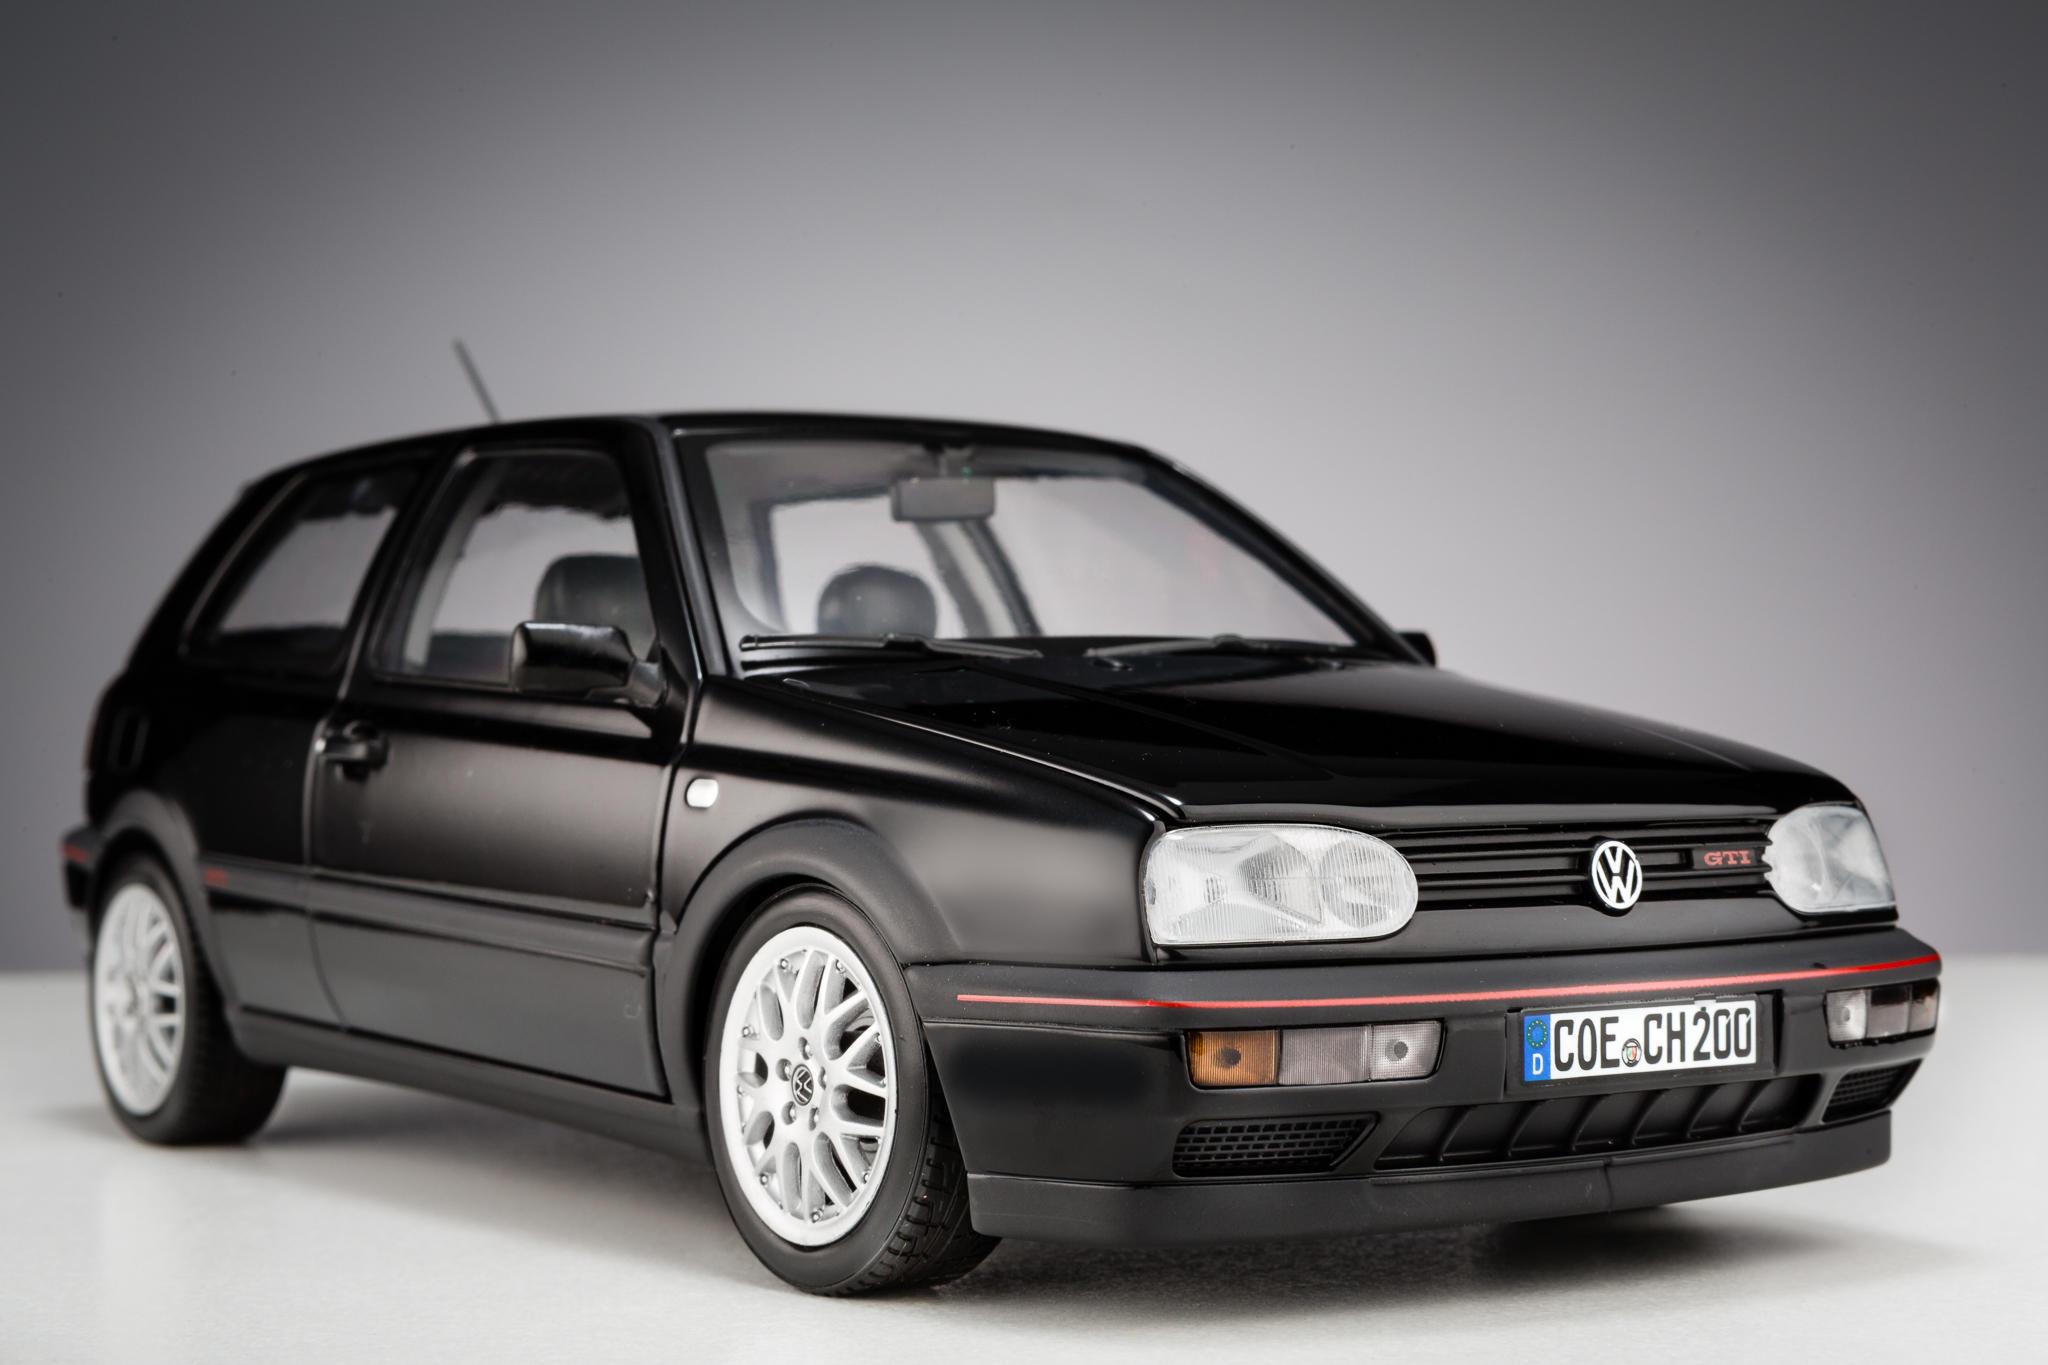 VW Golf GTI MK2 1986